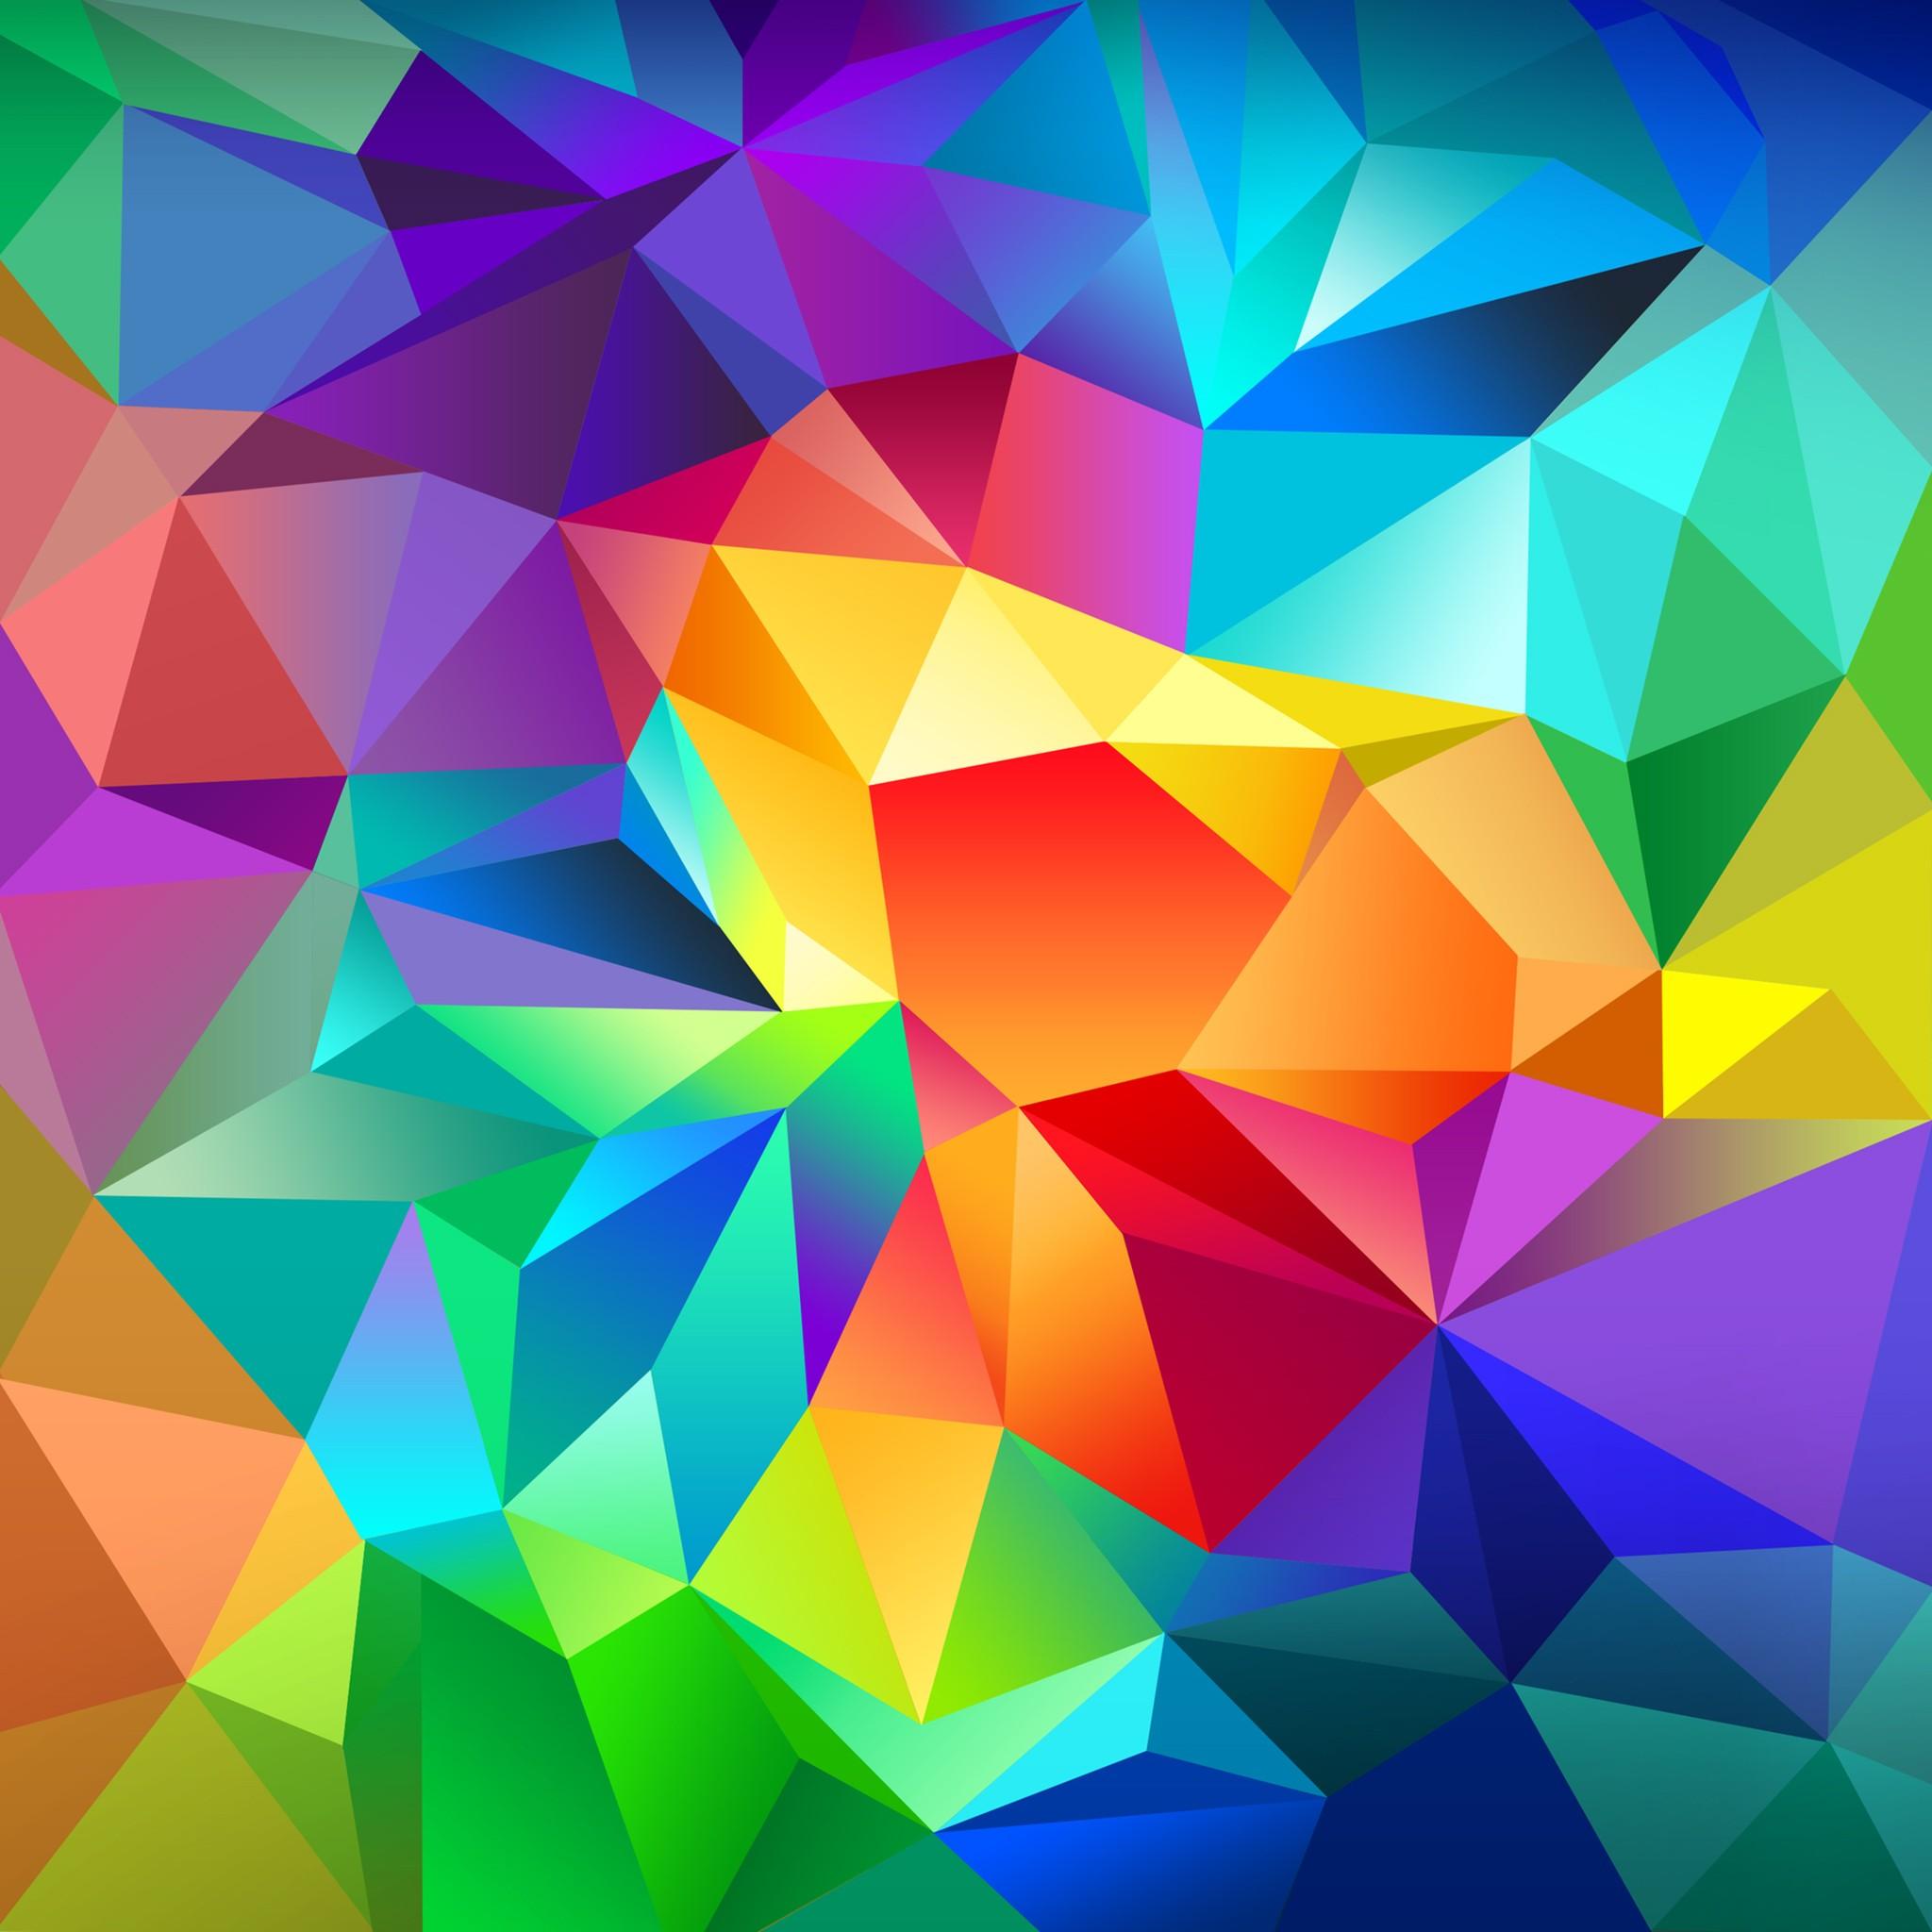 Wallpaper polygon, 4k, HD wallpaper, android wallpaper